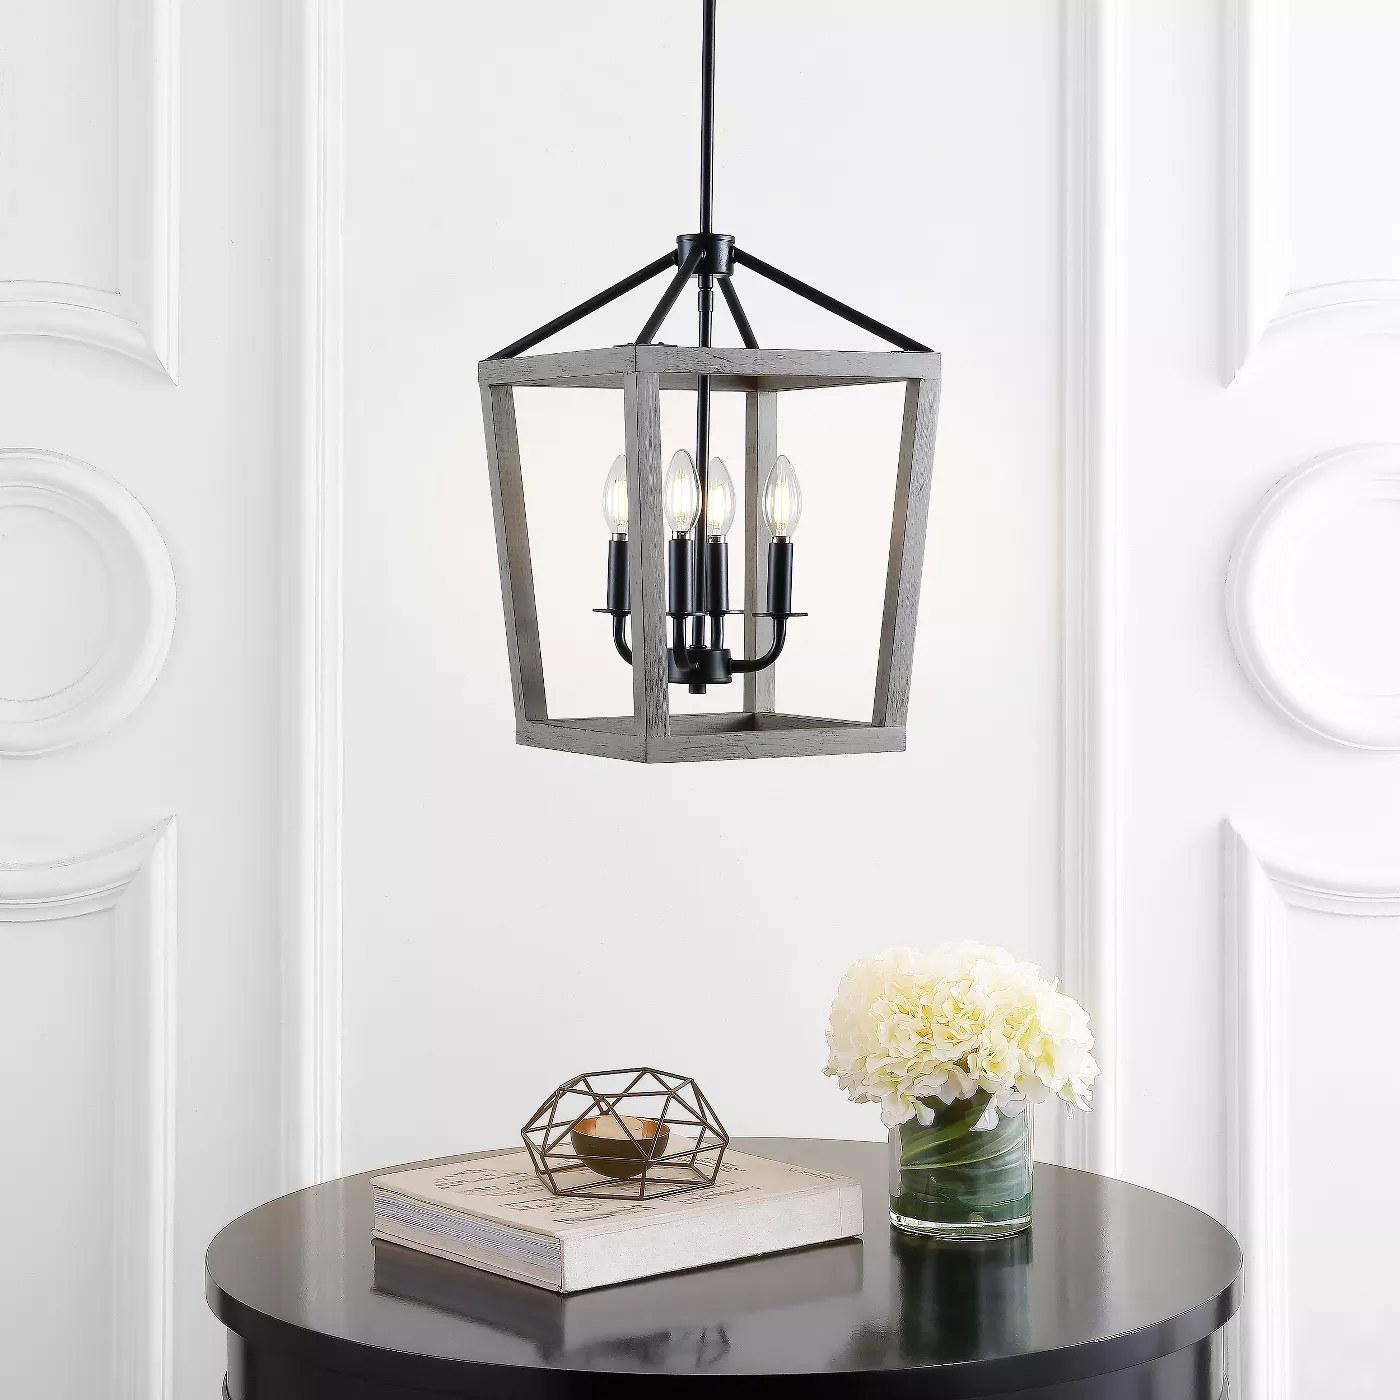 The pendant lamp